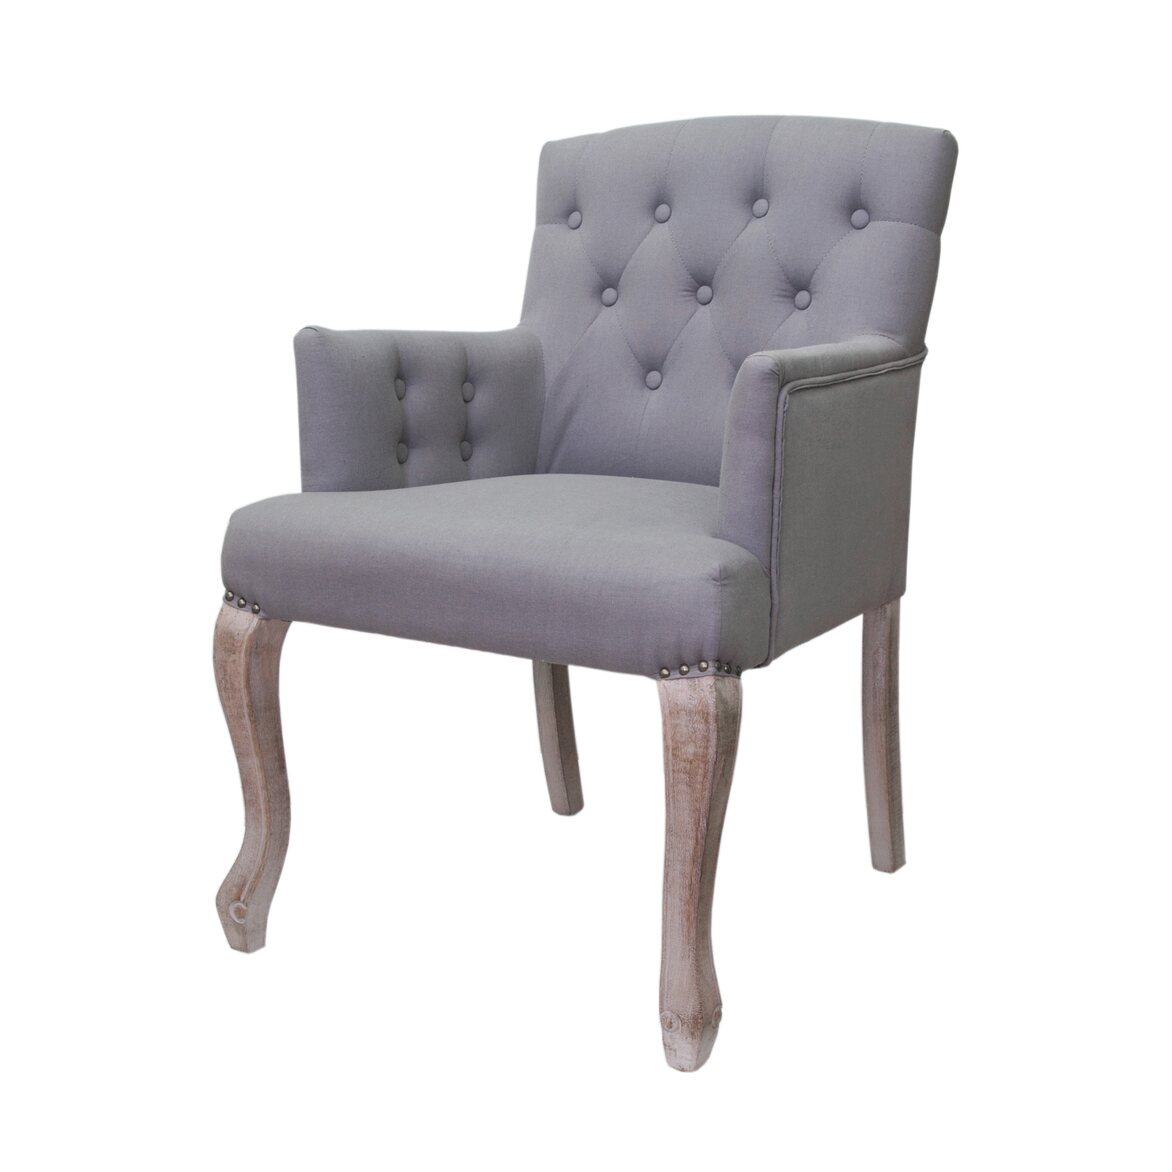 Кресло Deron grey ver.2 4 | Кресло-стул Kingsby